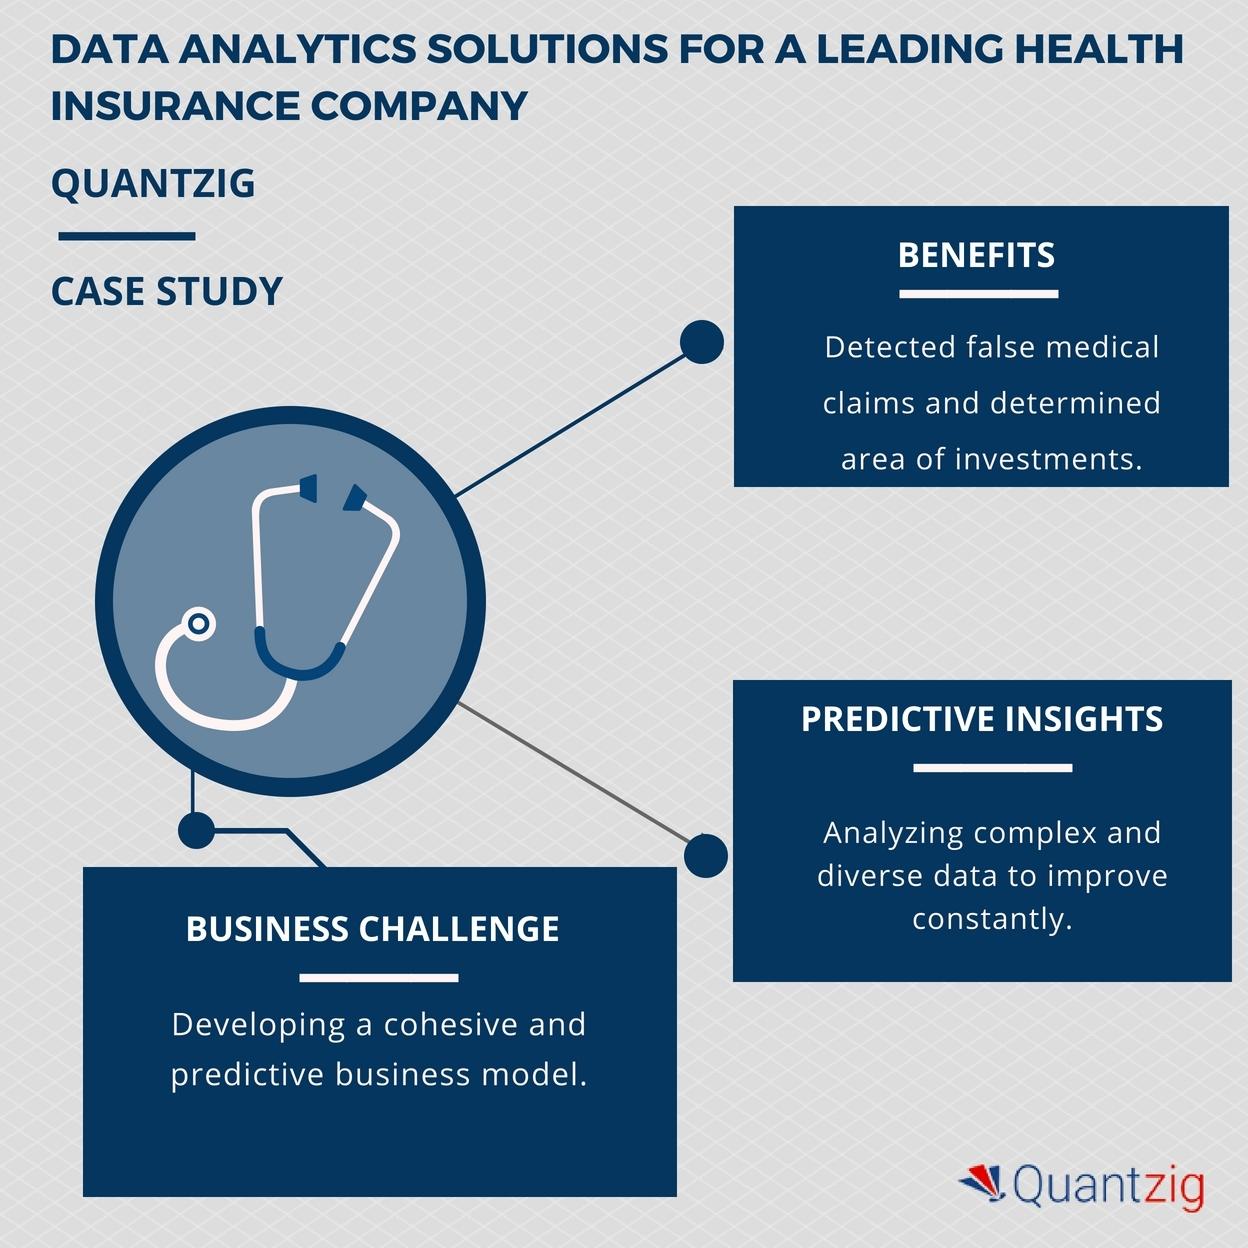 Leveraging Big Data Analytics to Improve the Utilization